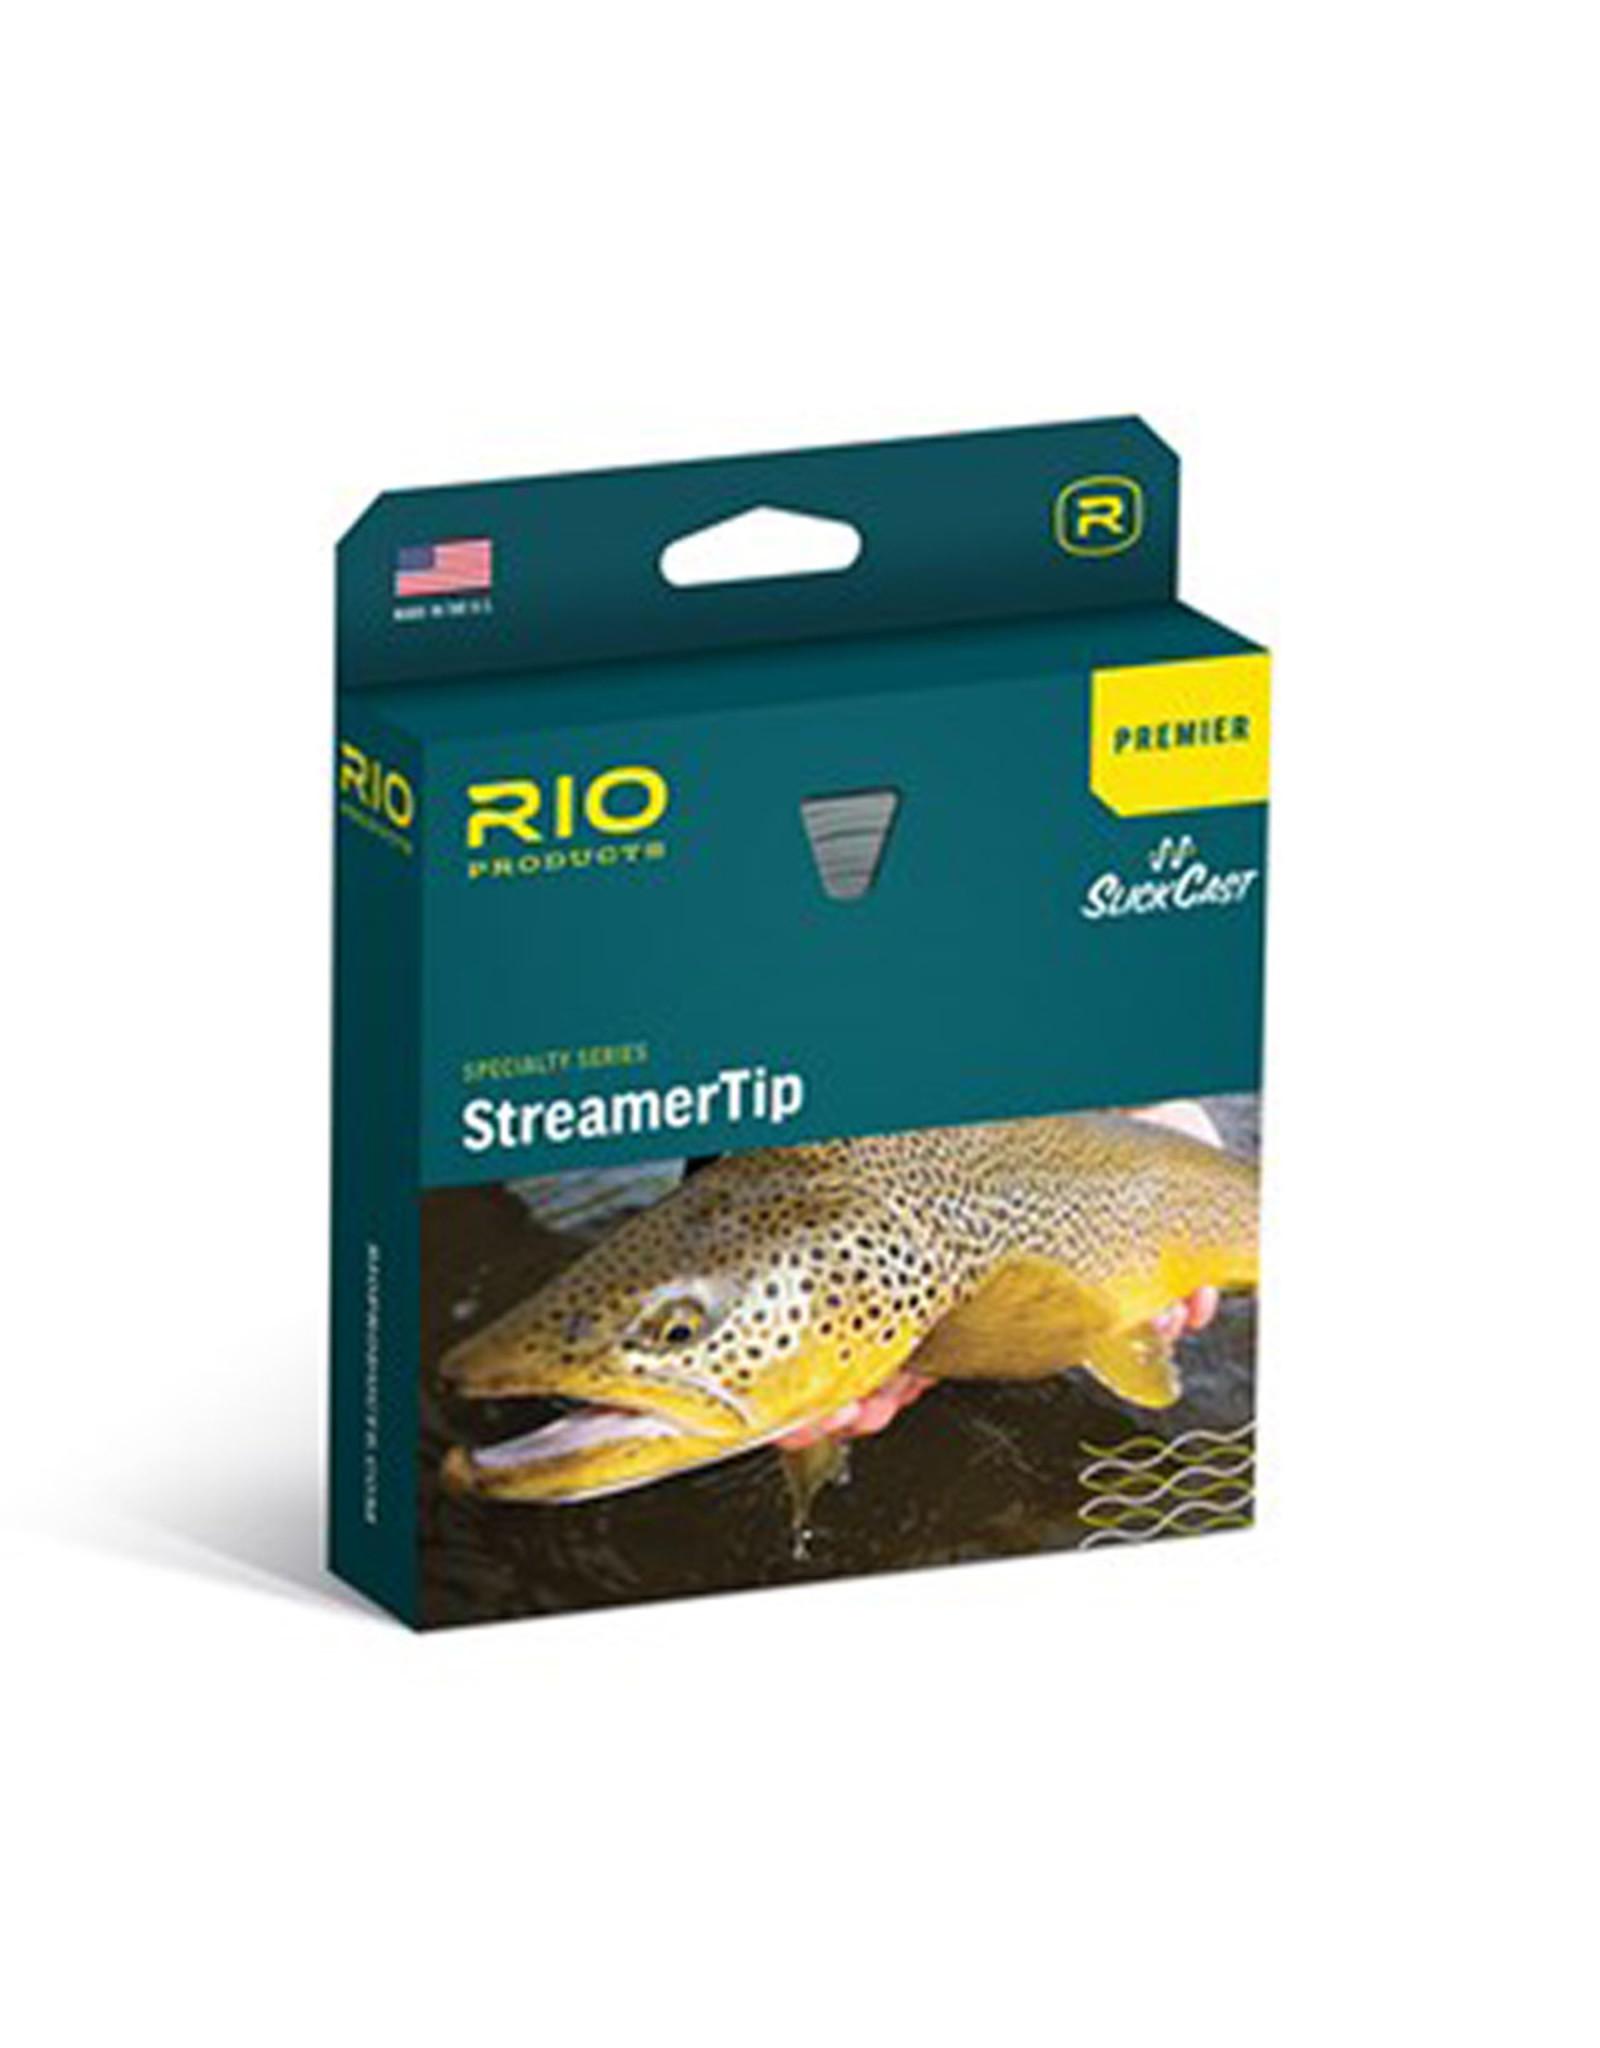 RIO Products Premier Streamer Tip F/I